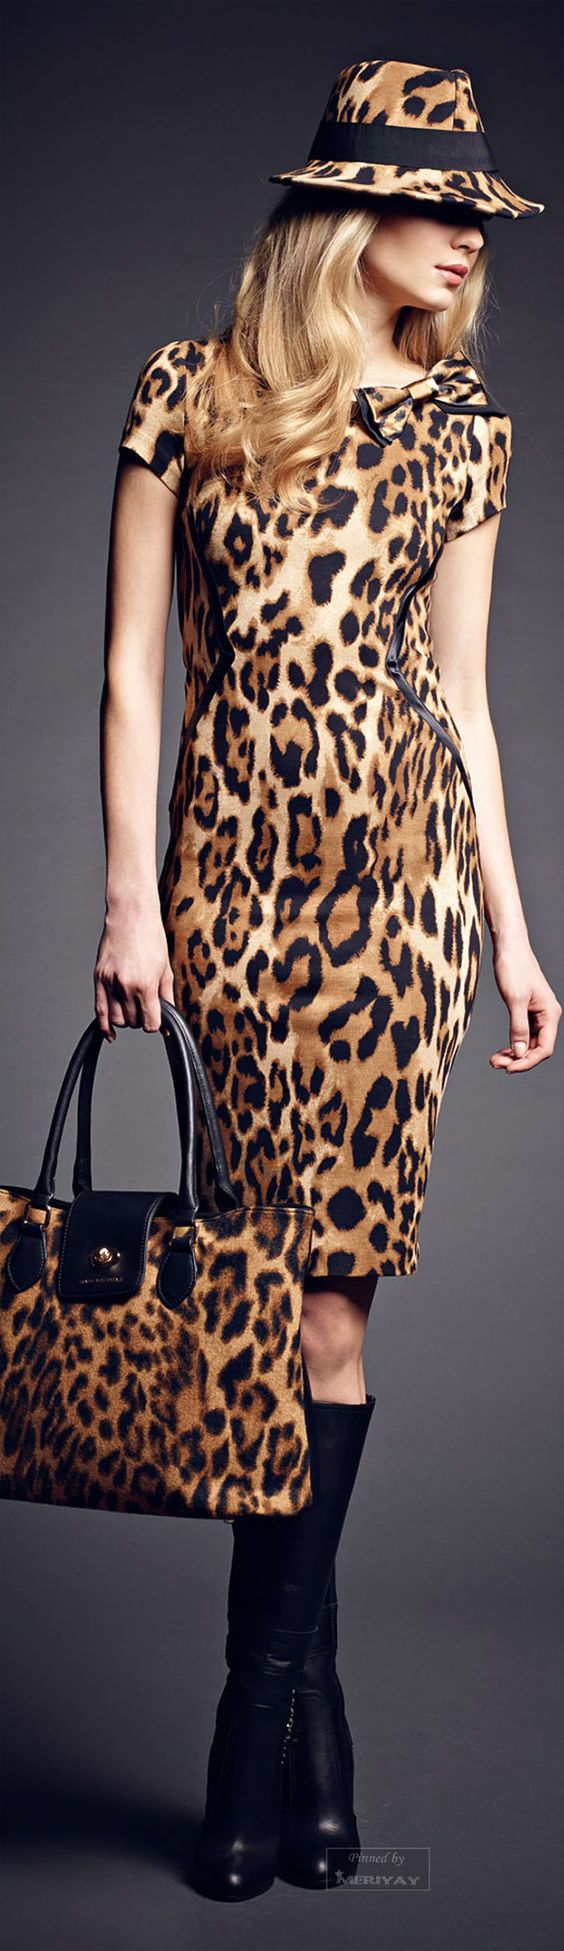 vestidos animal print 3